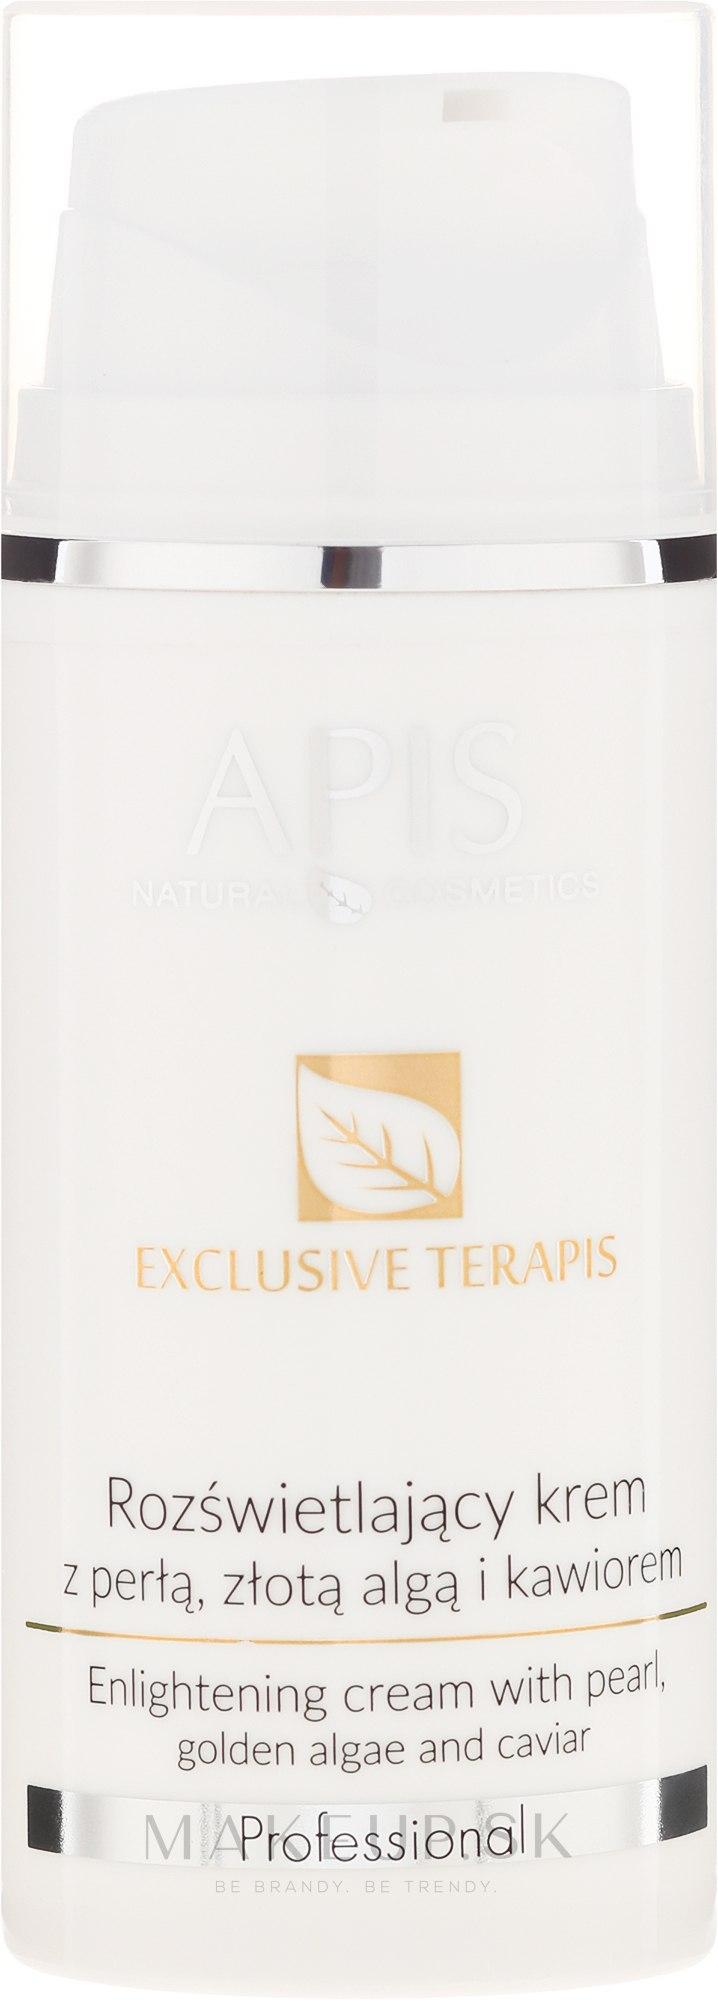 Krém na tvár - APIS Professional Exlusive terApis Face Cream — Obrázky 100 ml